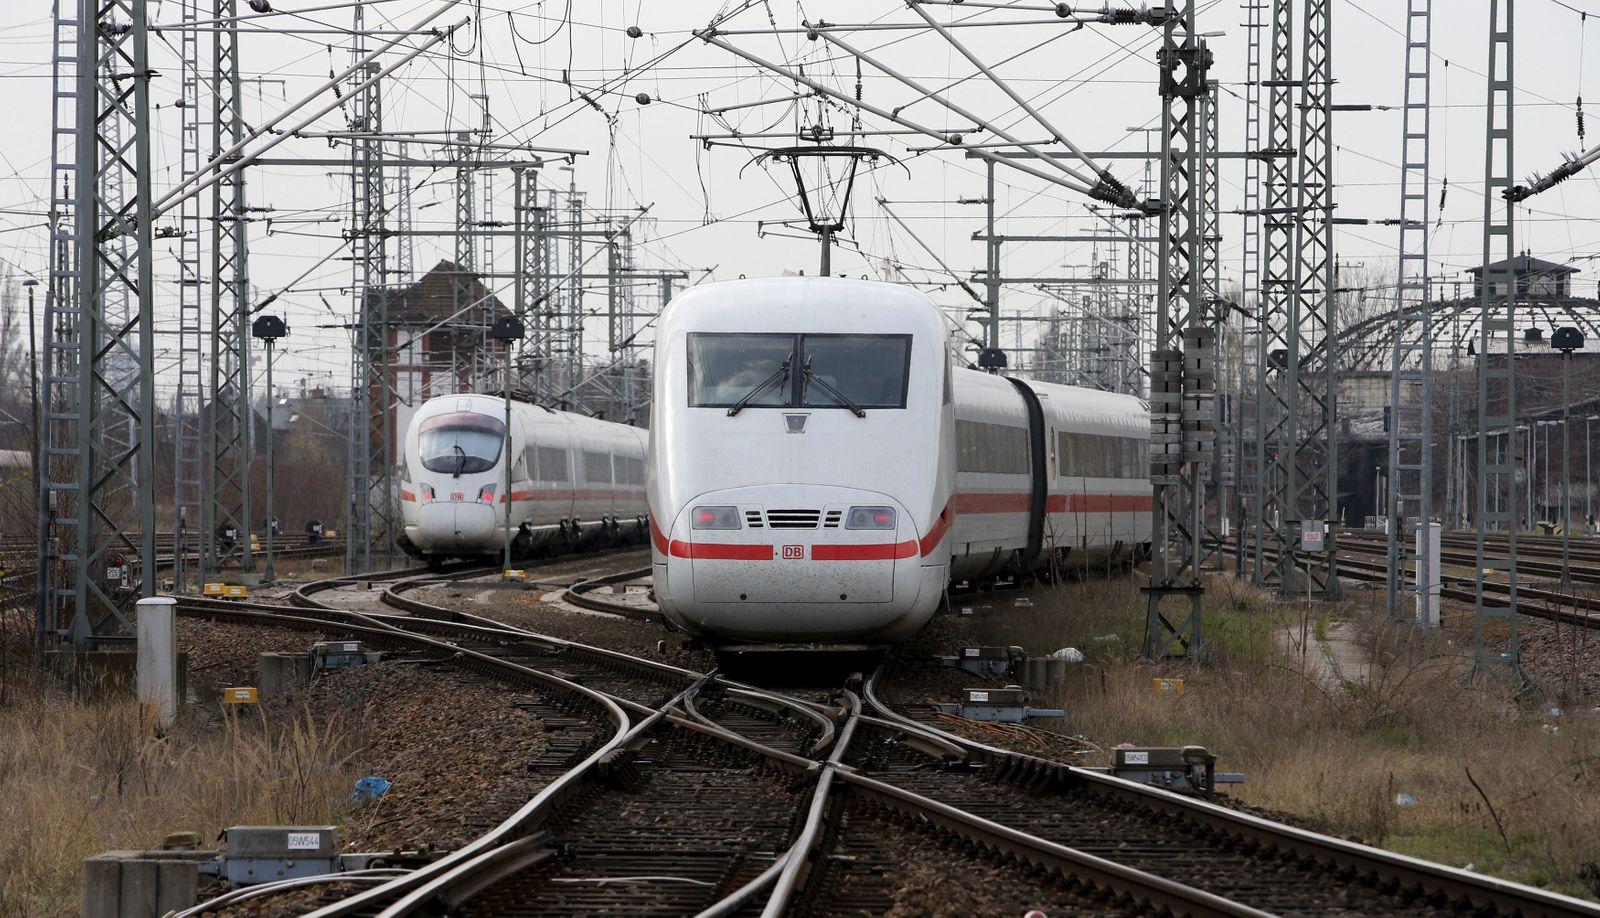 Deutsche Bahn / ICE